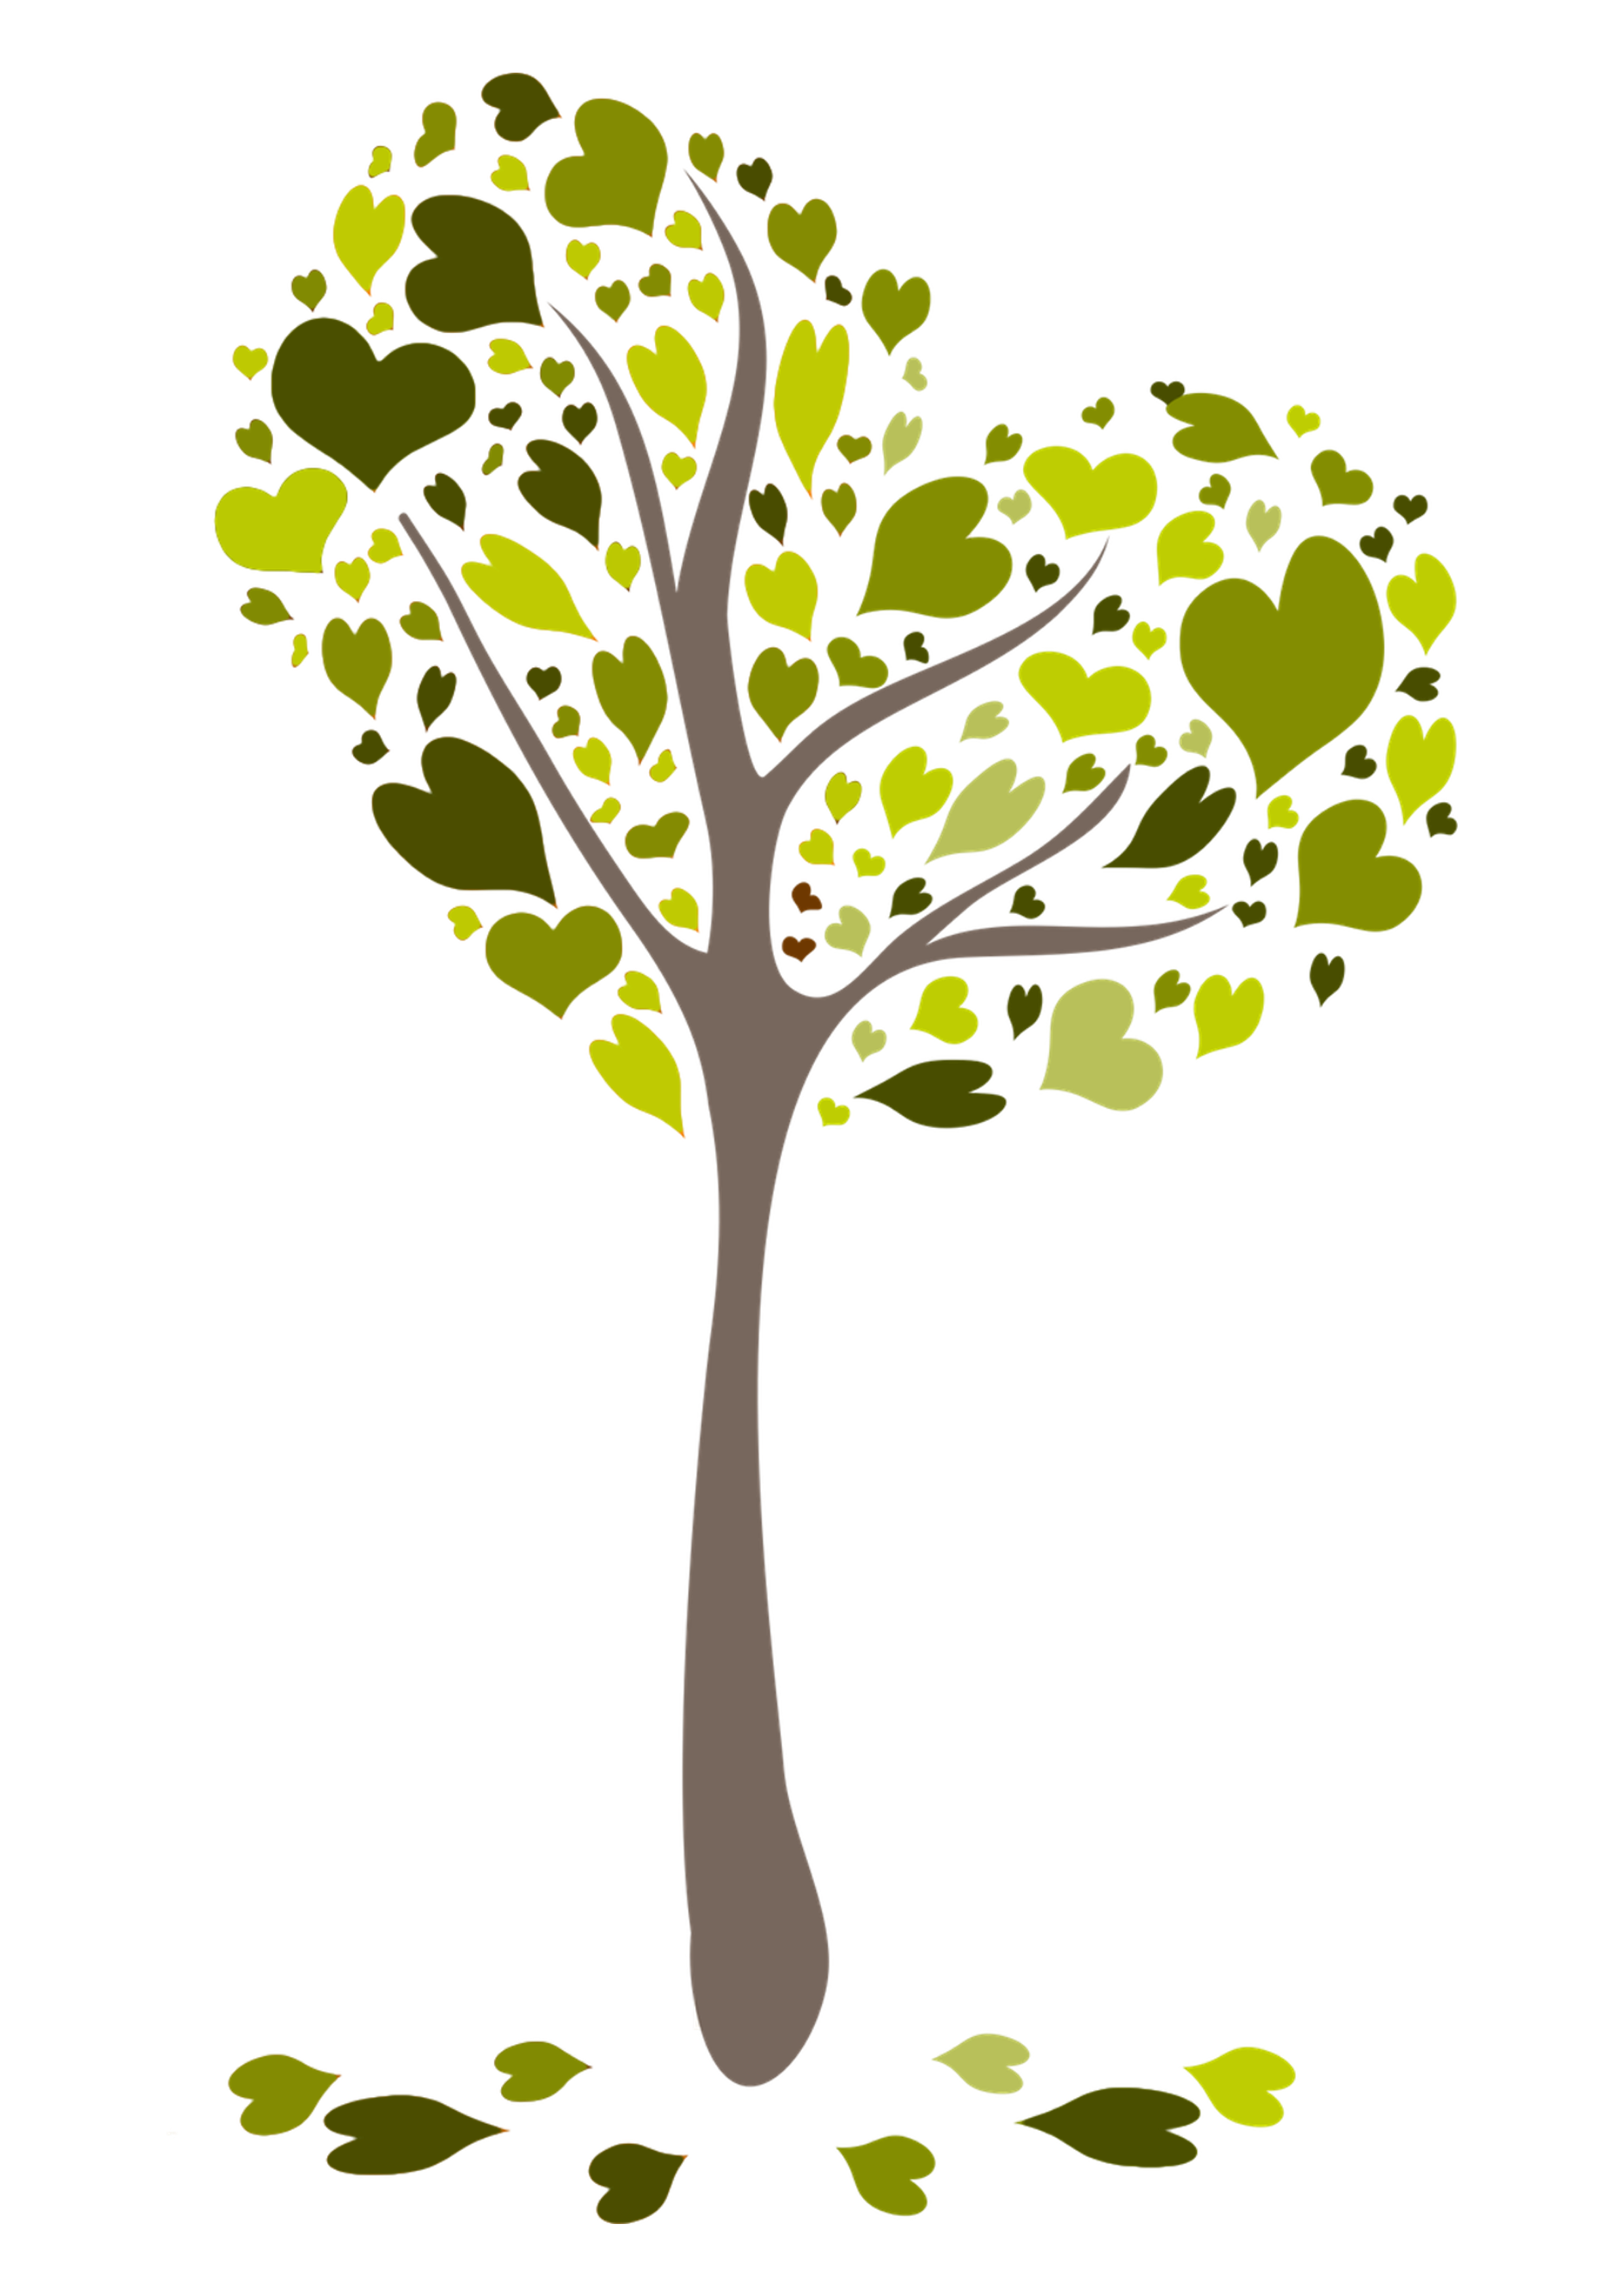 Kerze Herzchenbaum lindgrün